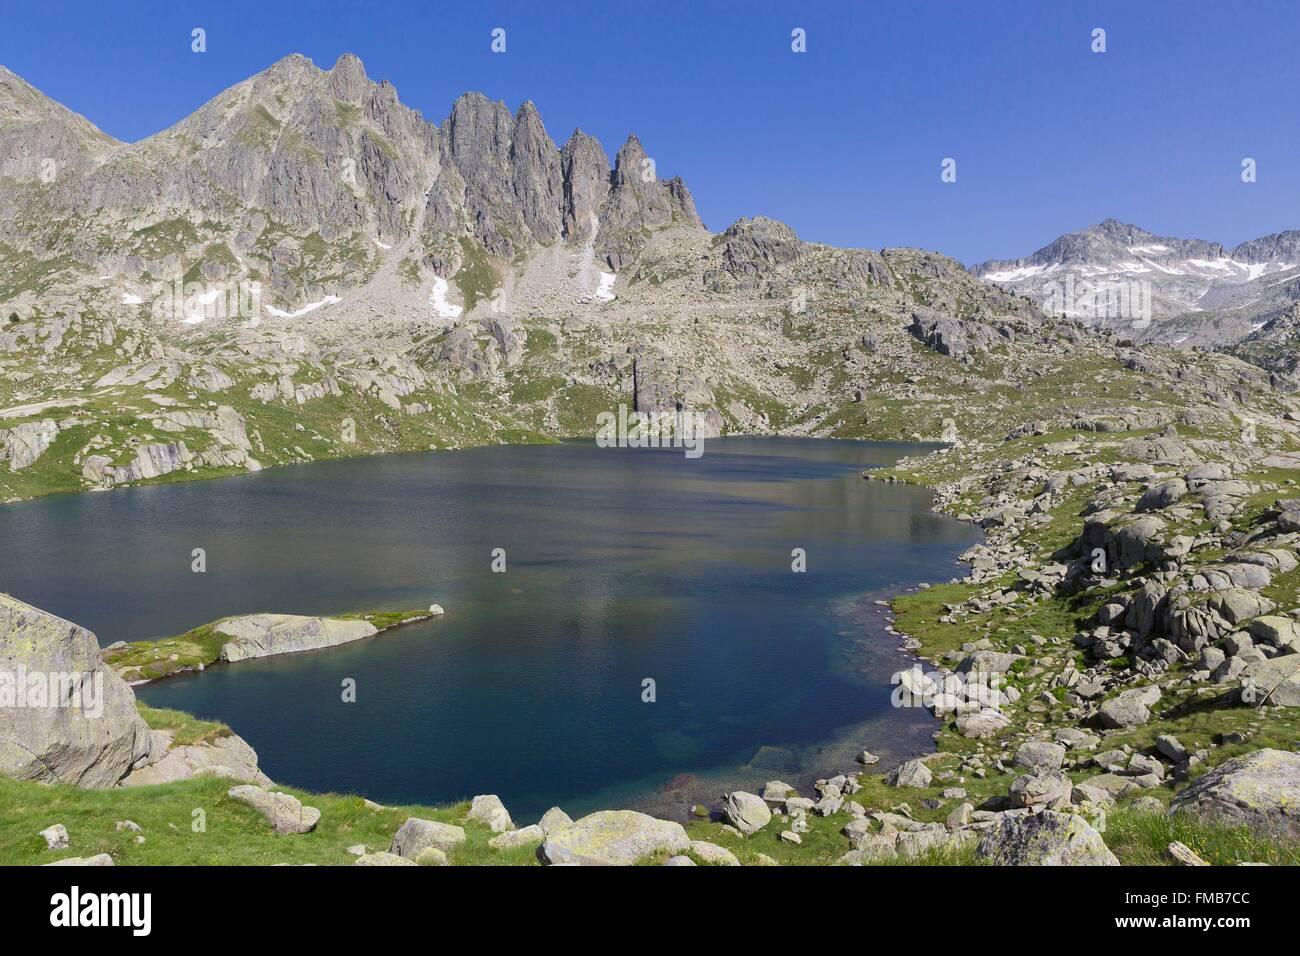 Spain, Catalonia, Val d'Aran, Arties, Aigüestortes i Estany de Sant Maurici National Park, Travessani lake - Stock Image